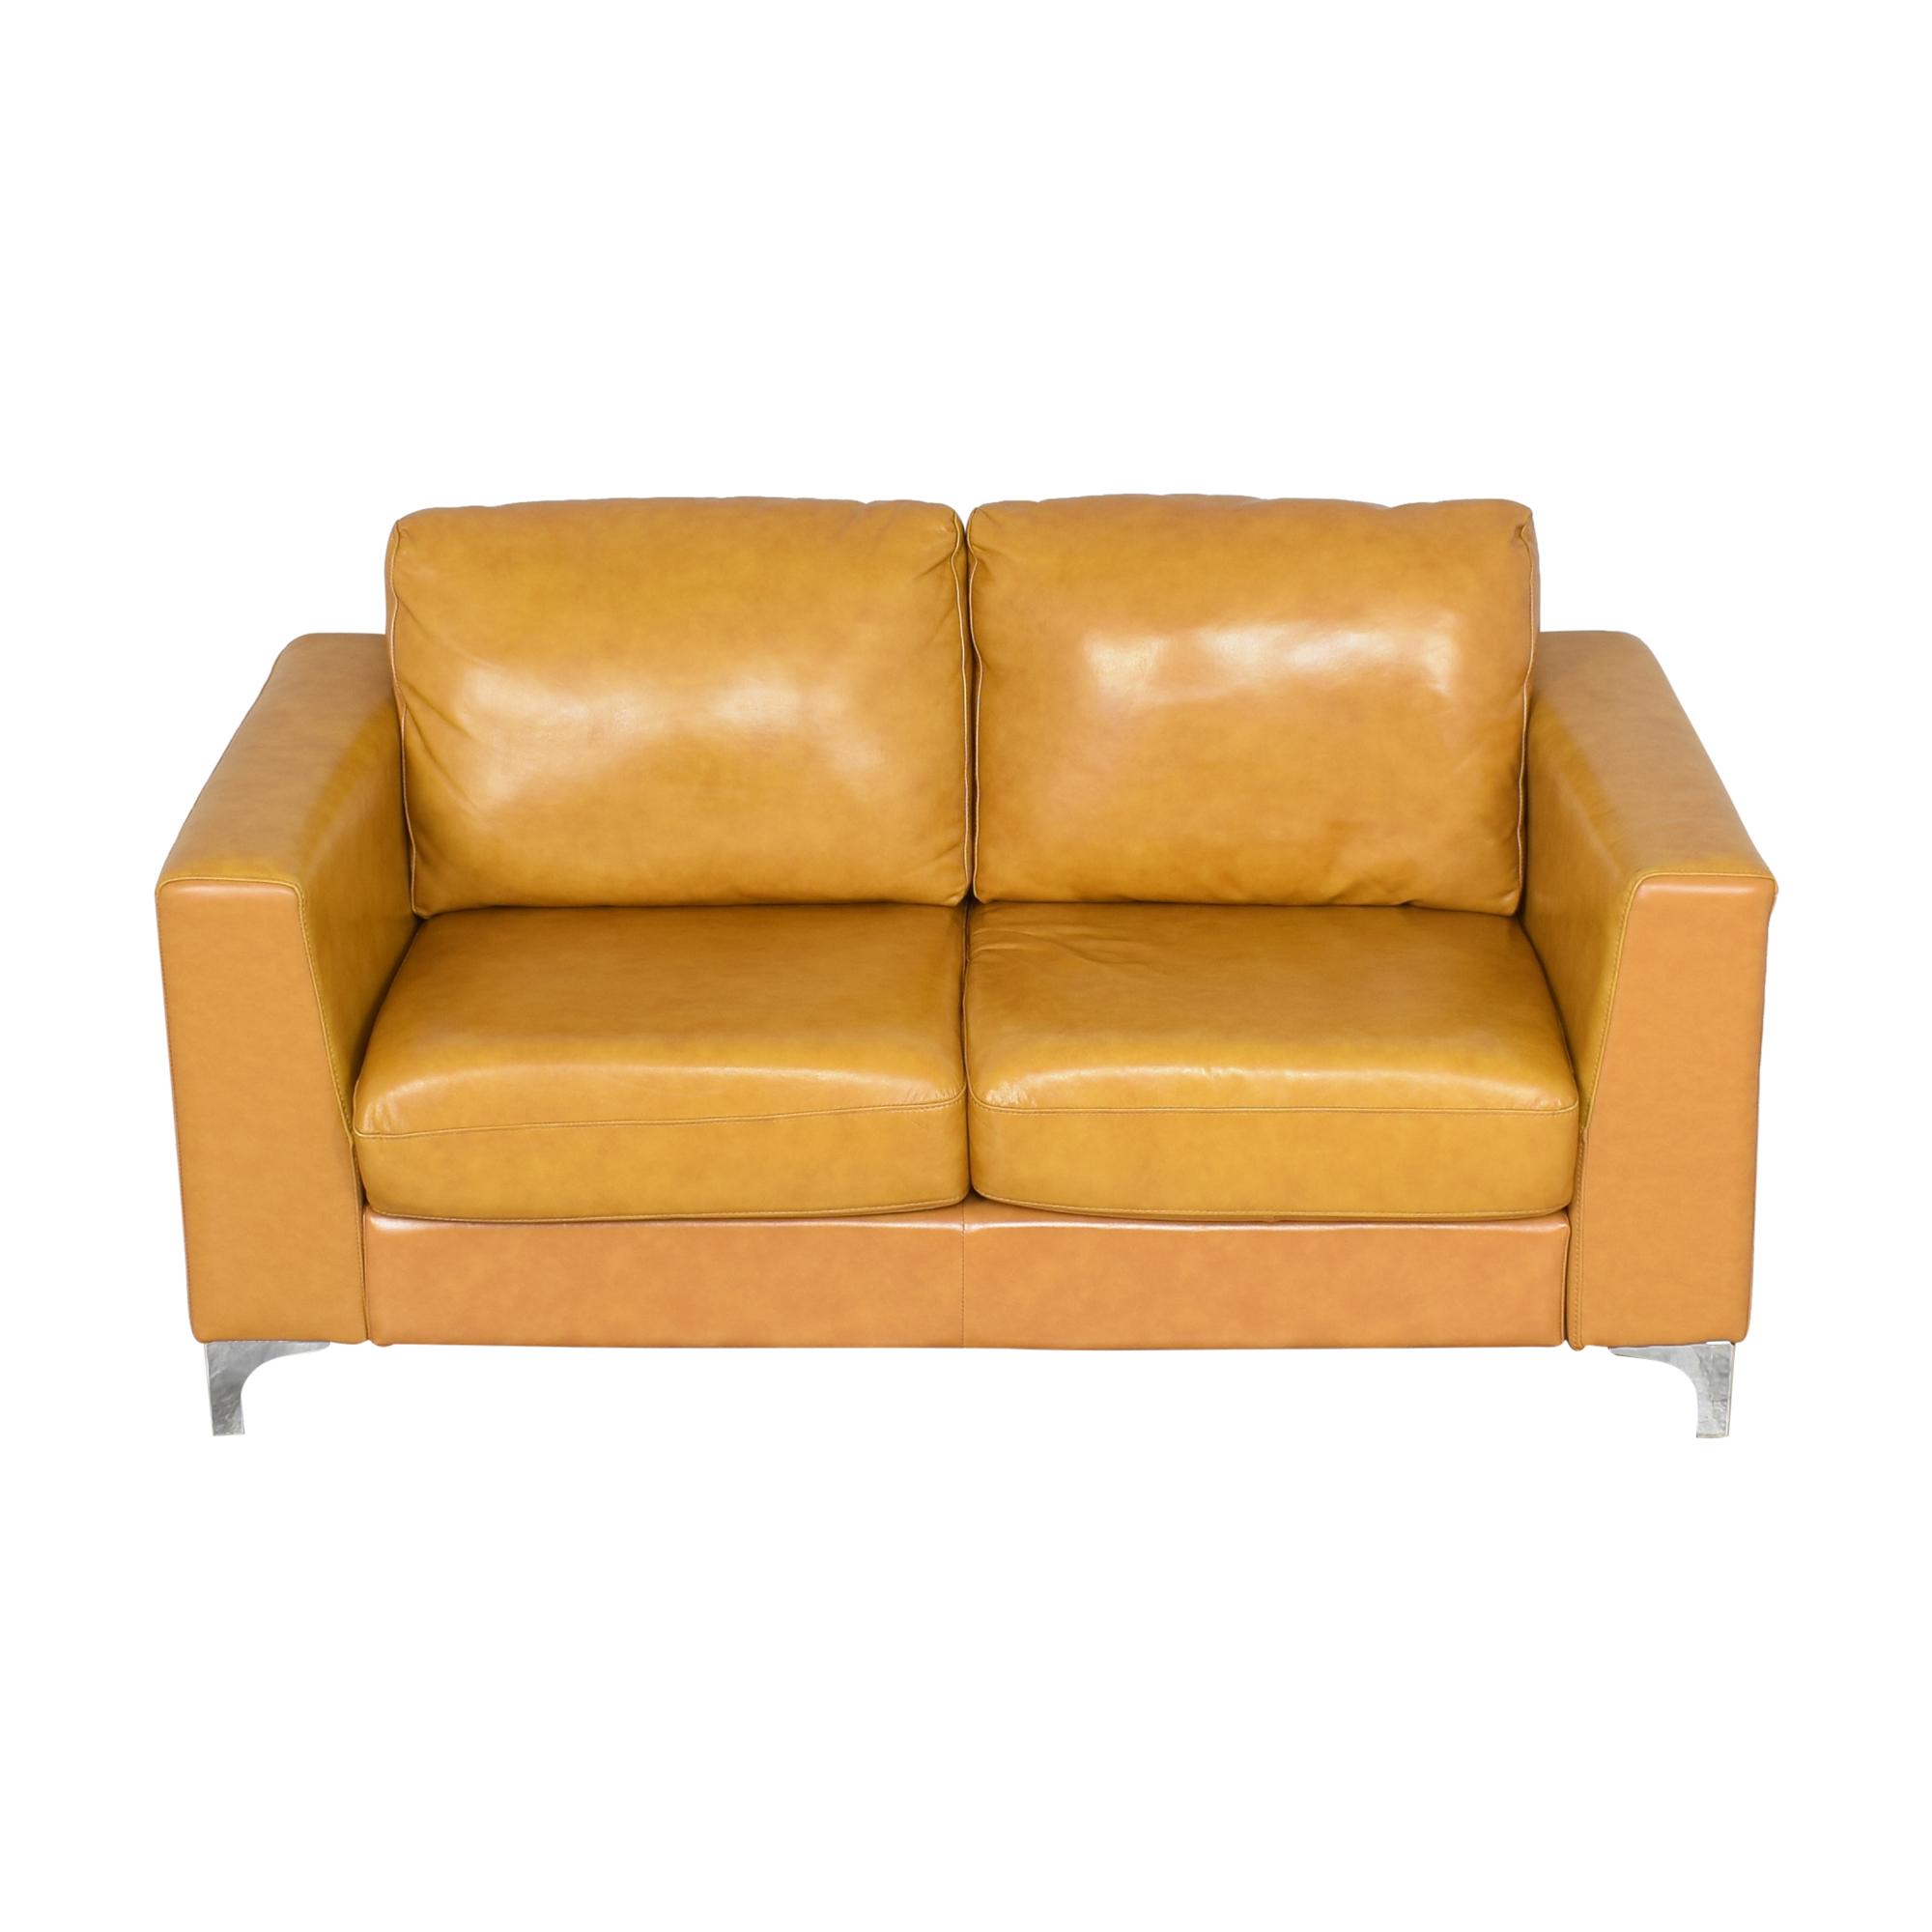 Wayfair Wayfair Modern Two Cushion Sofa ct